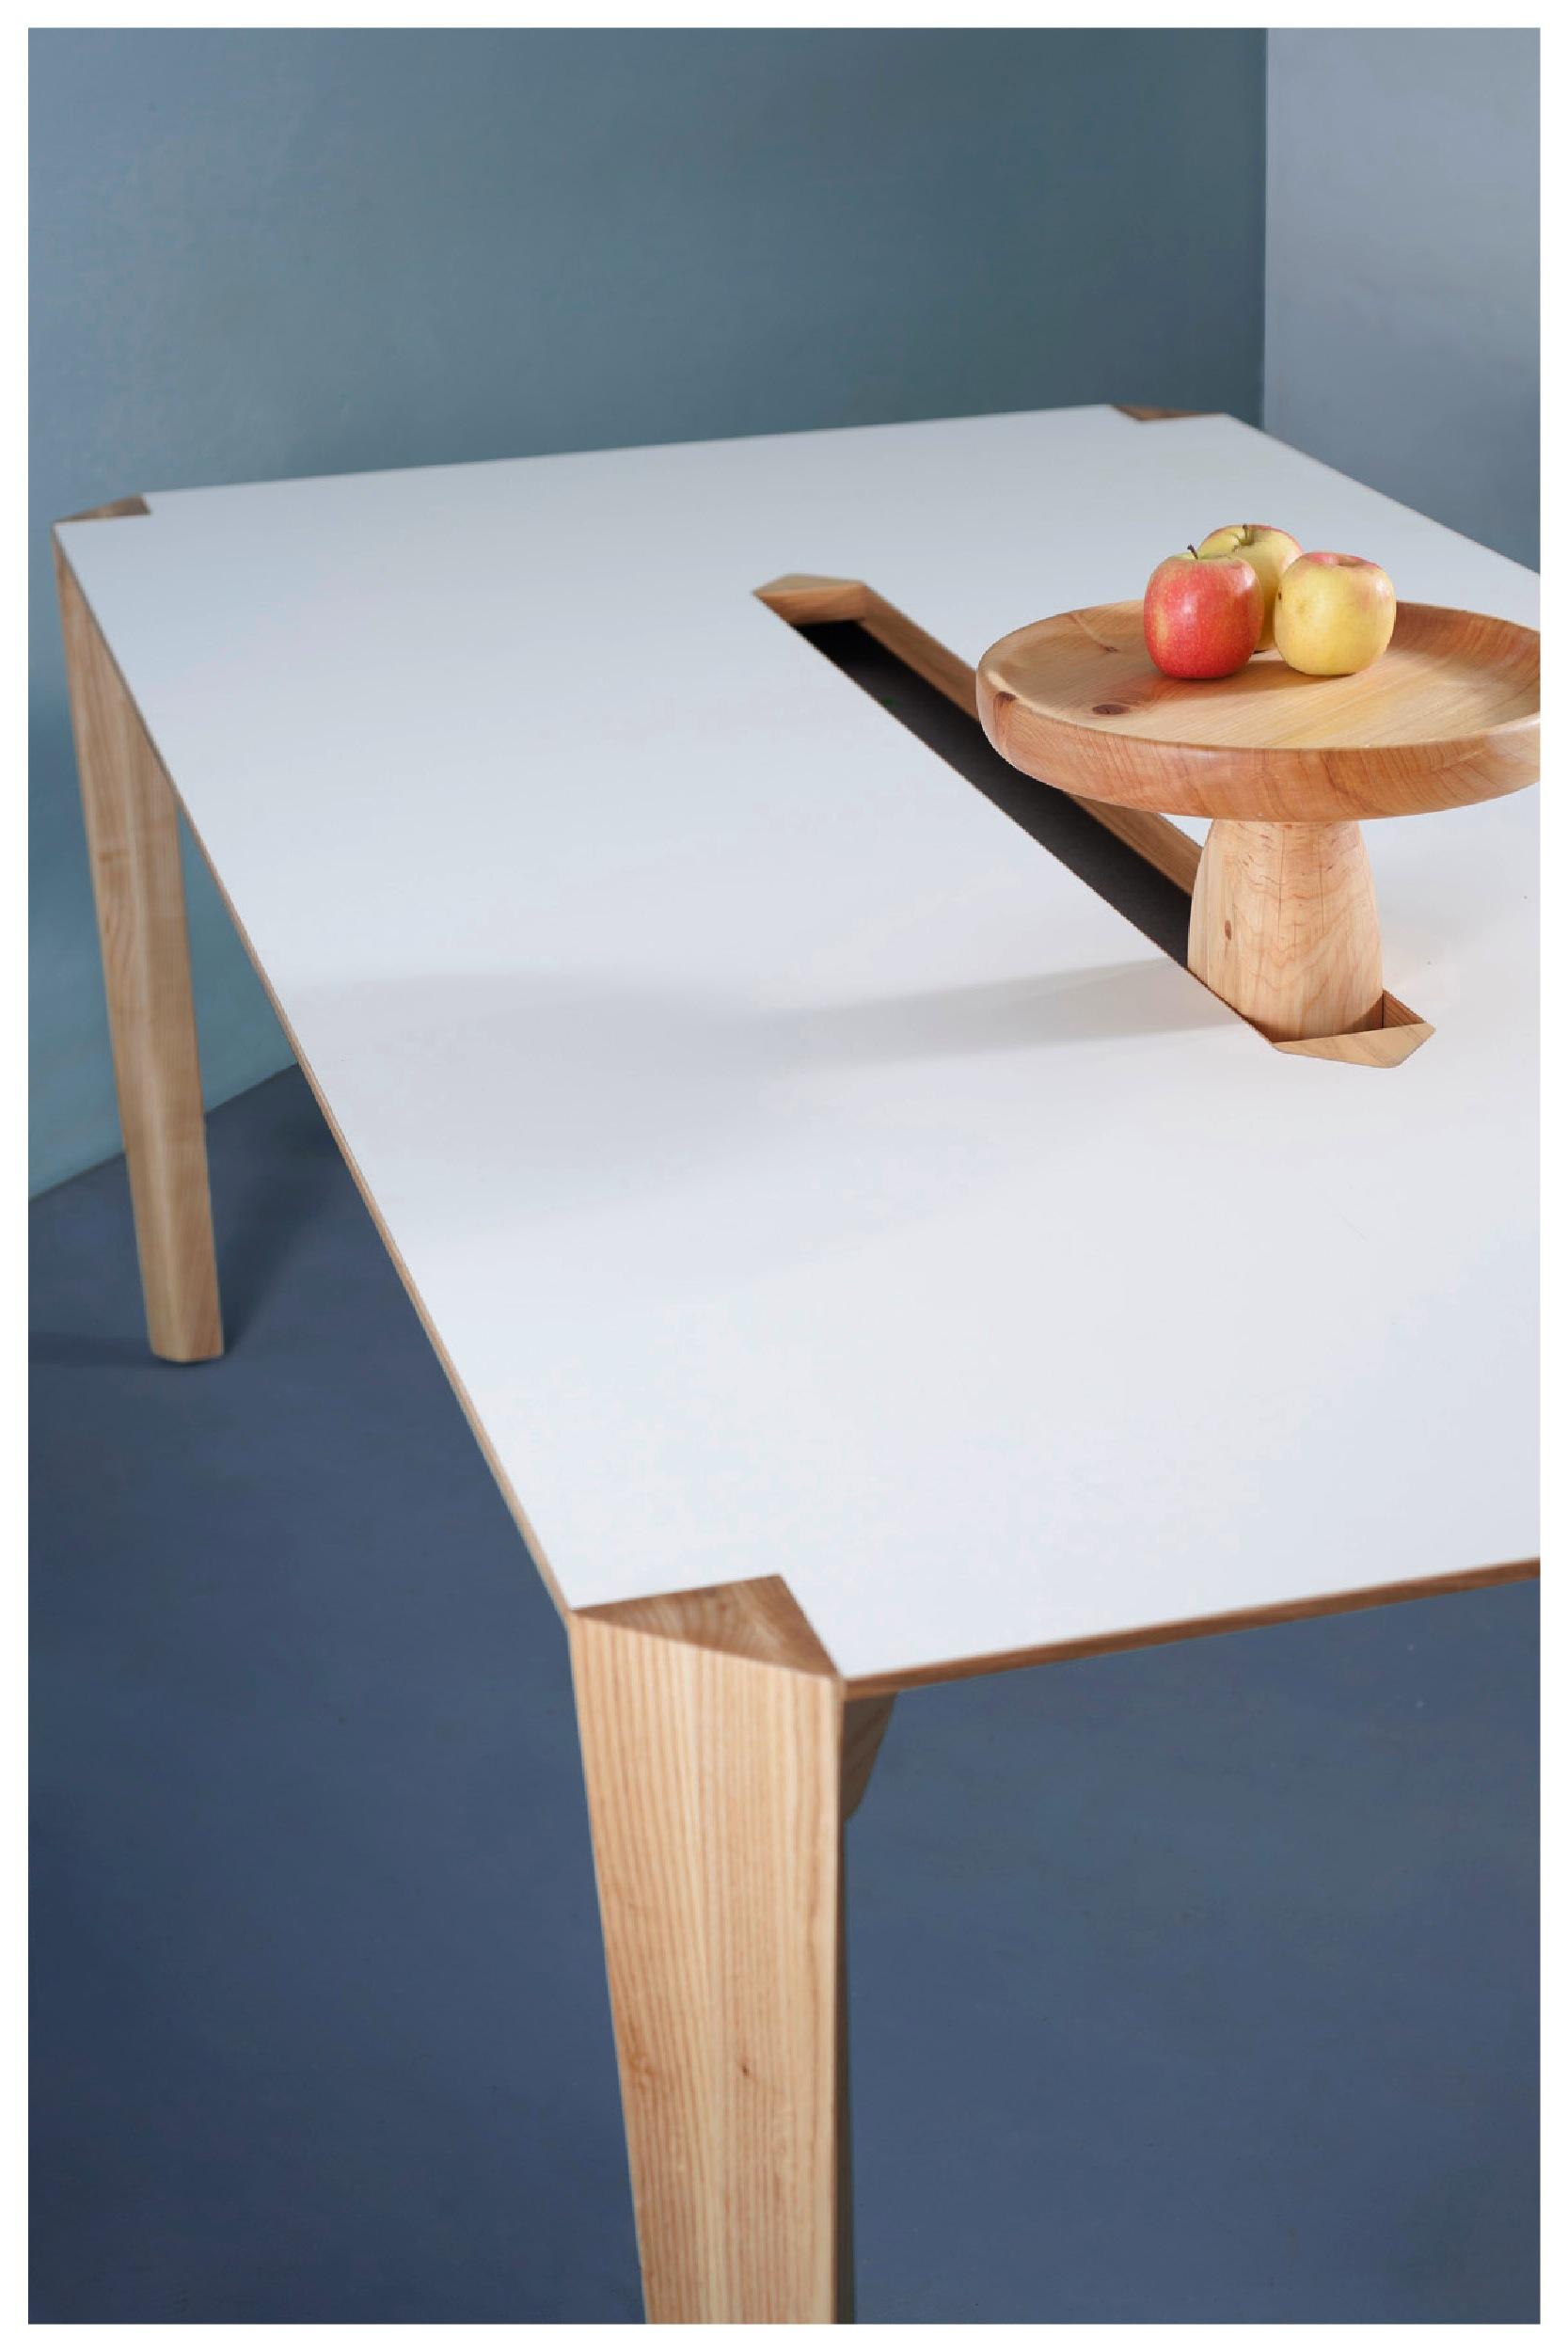 MOS facet table_5.jpg